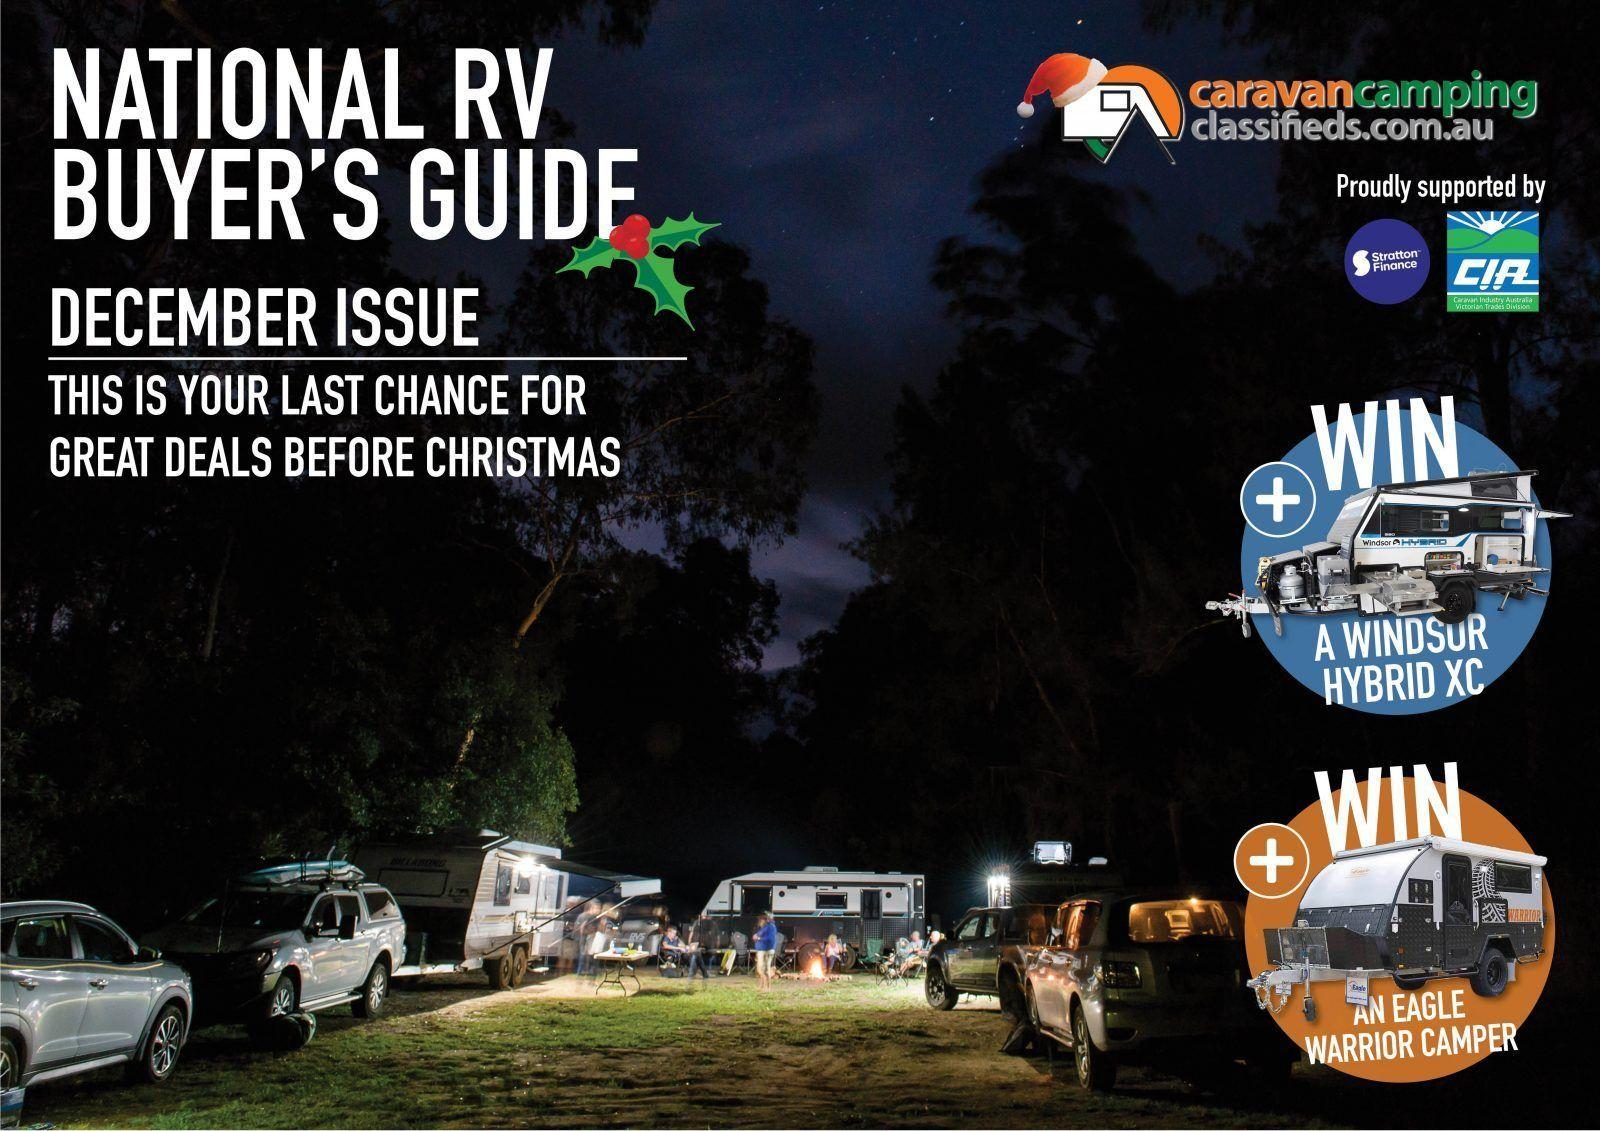 National rv buyer's guide december/january